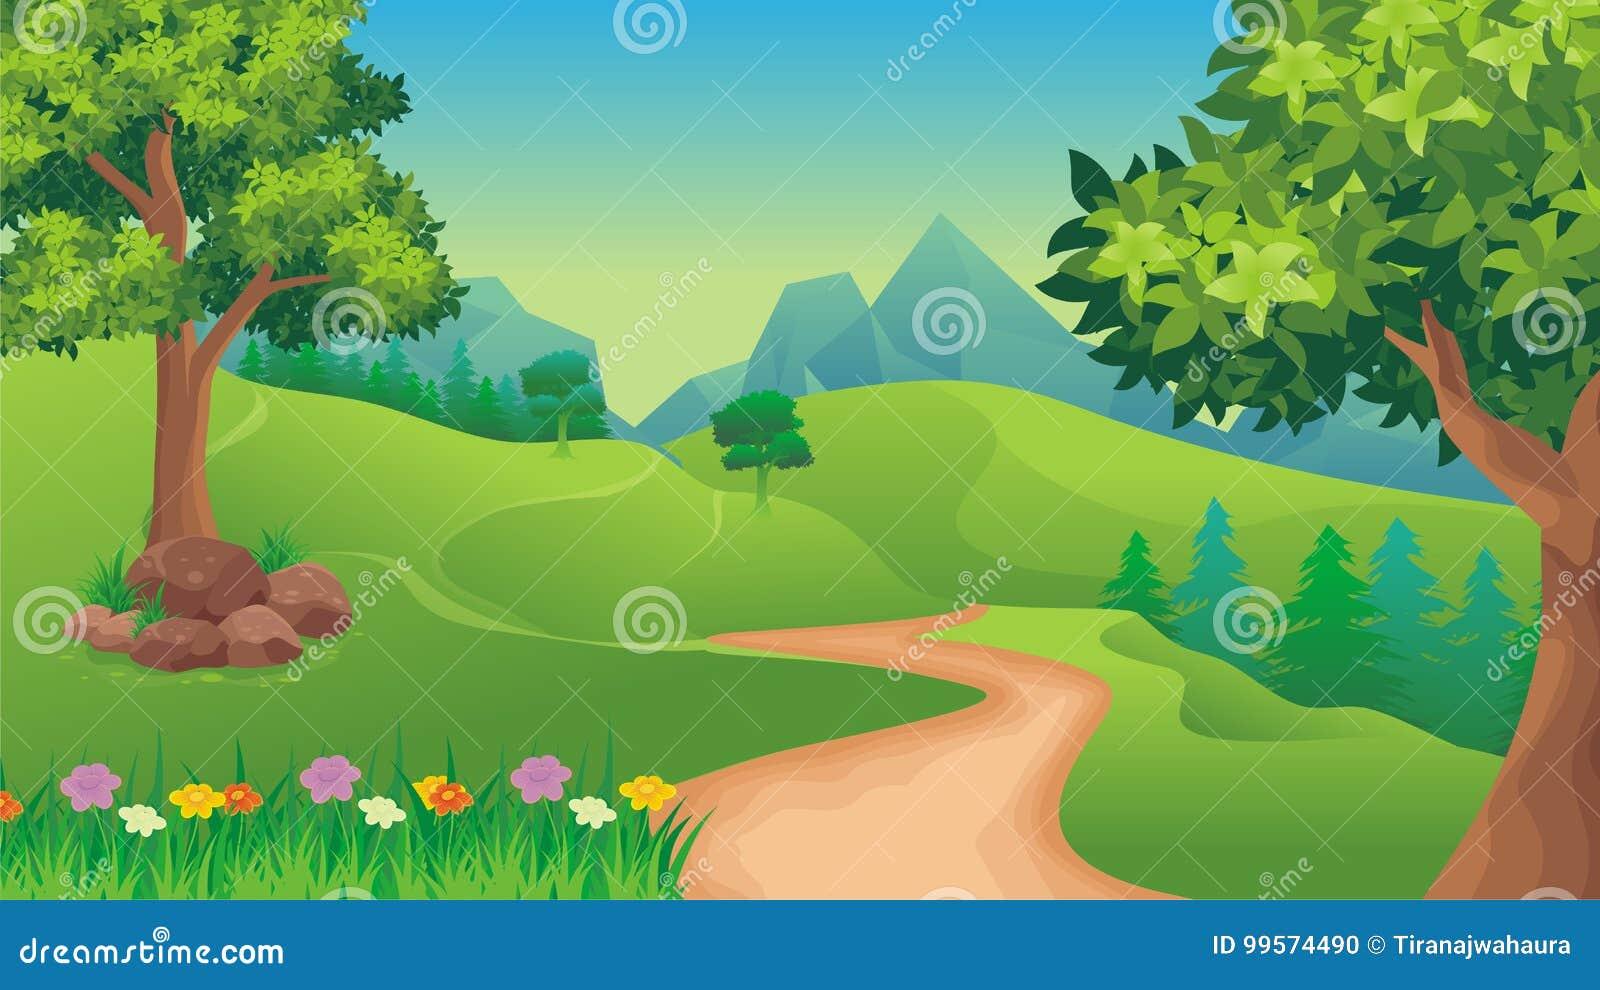 Nature landscape, cartoon game background